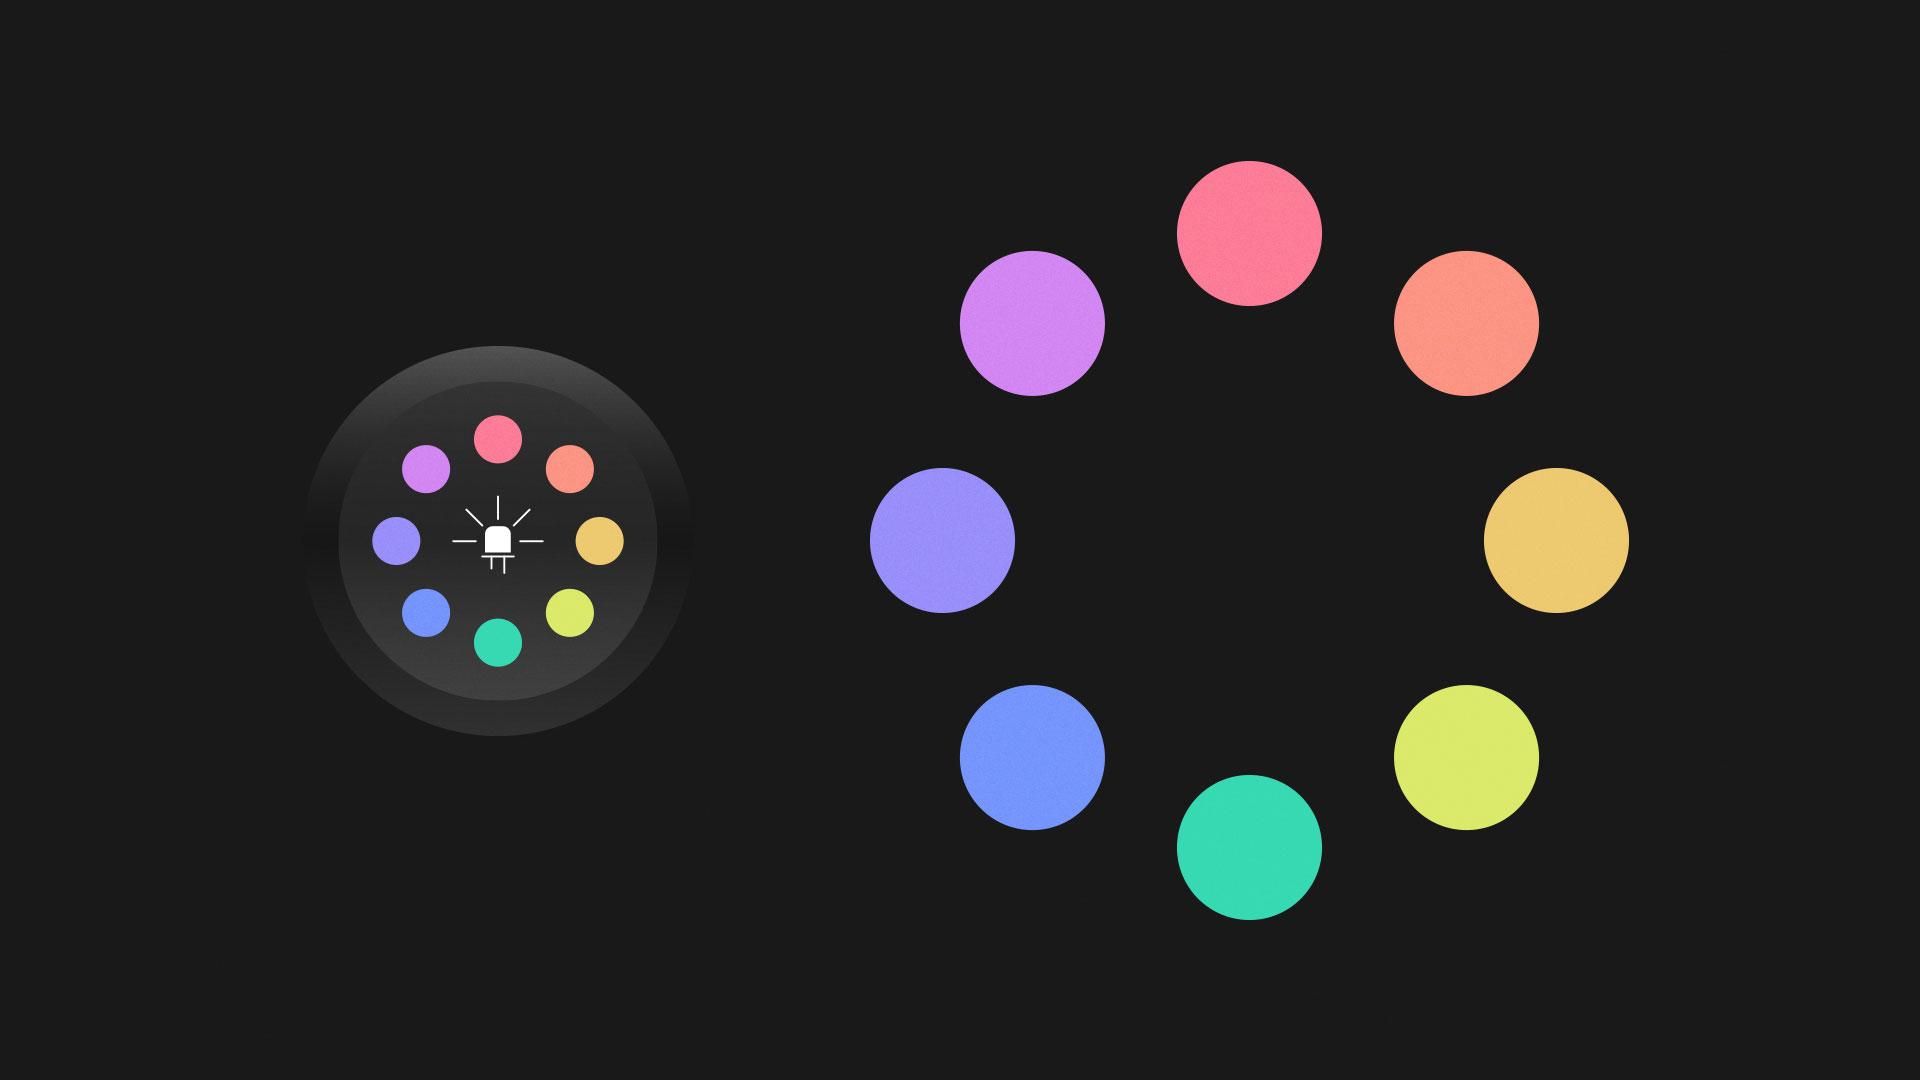 b15_app_color.jpg